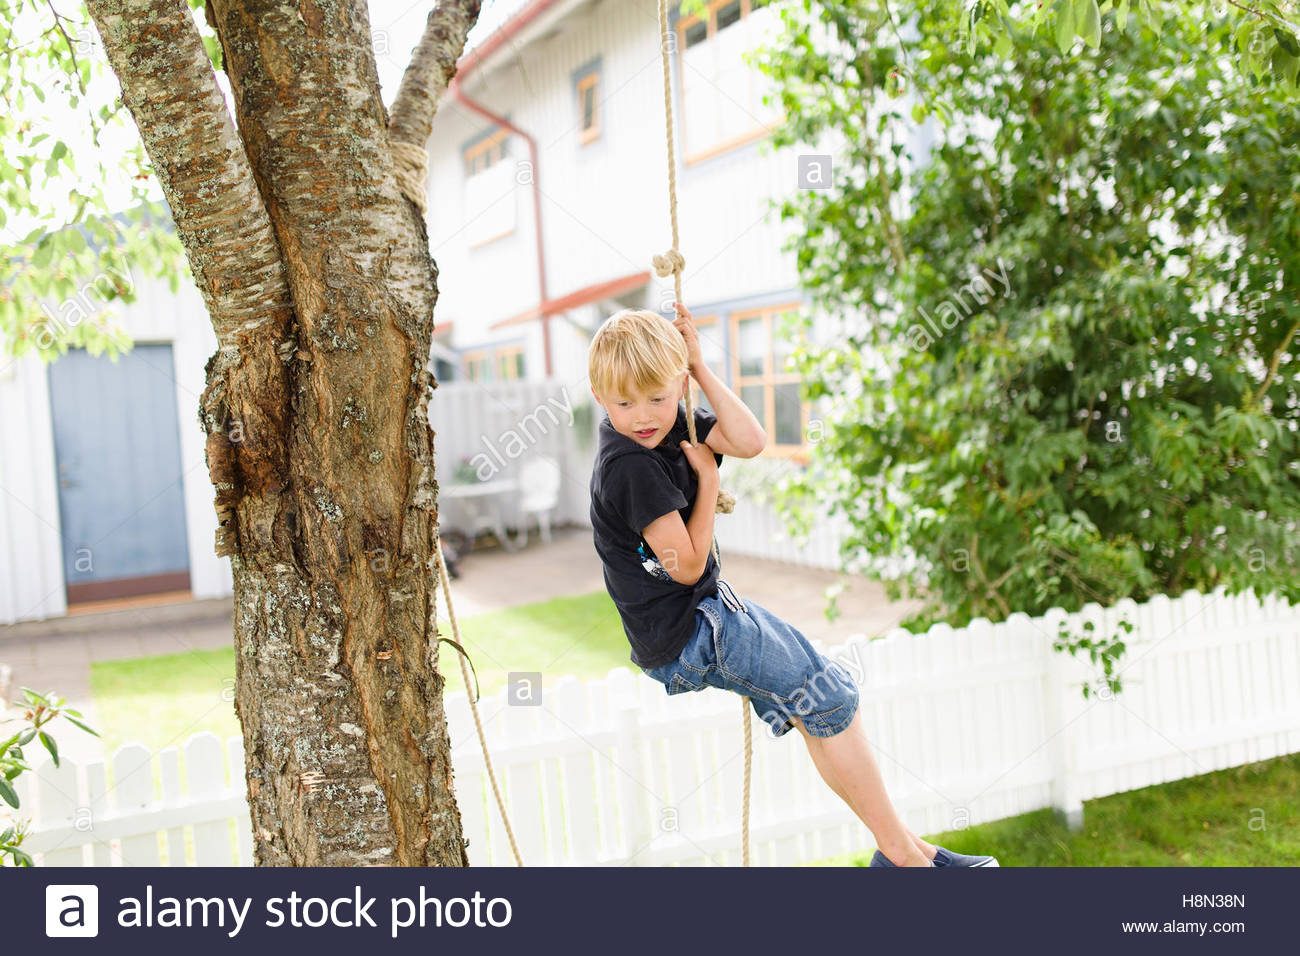 Girl (6 7) Climbing Rope In Backyard